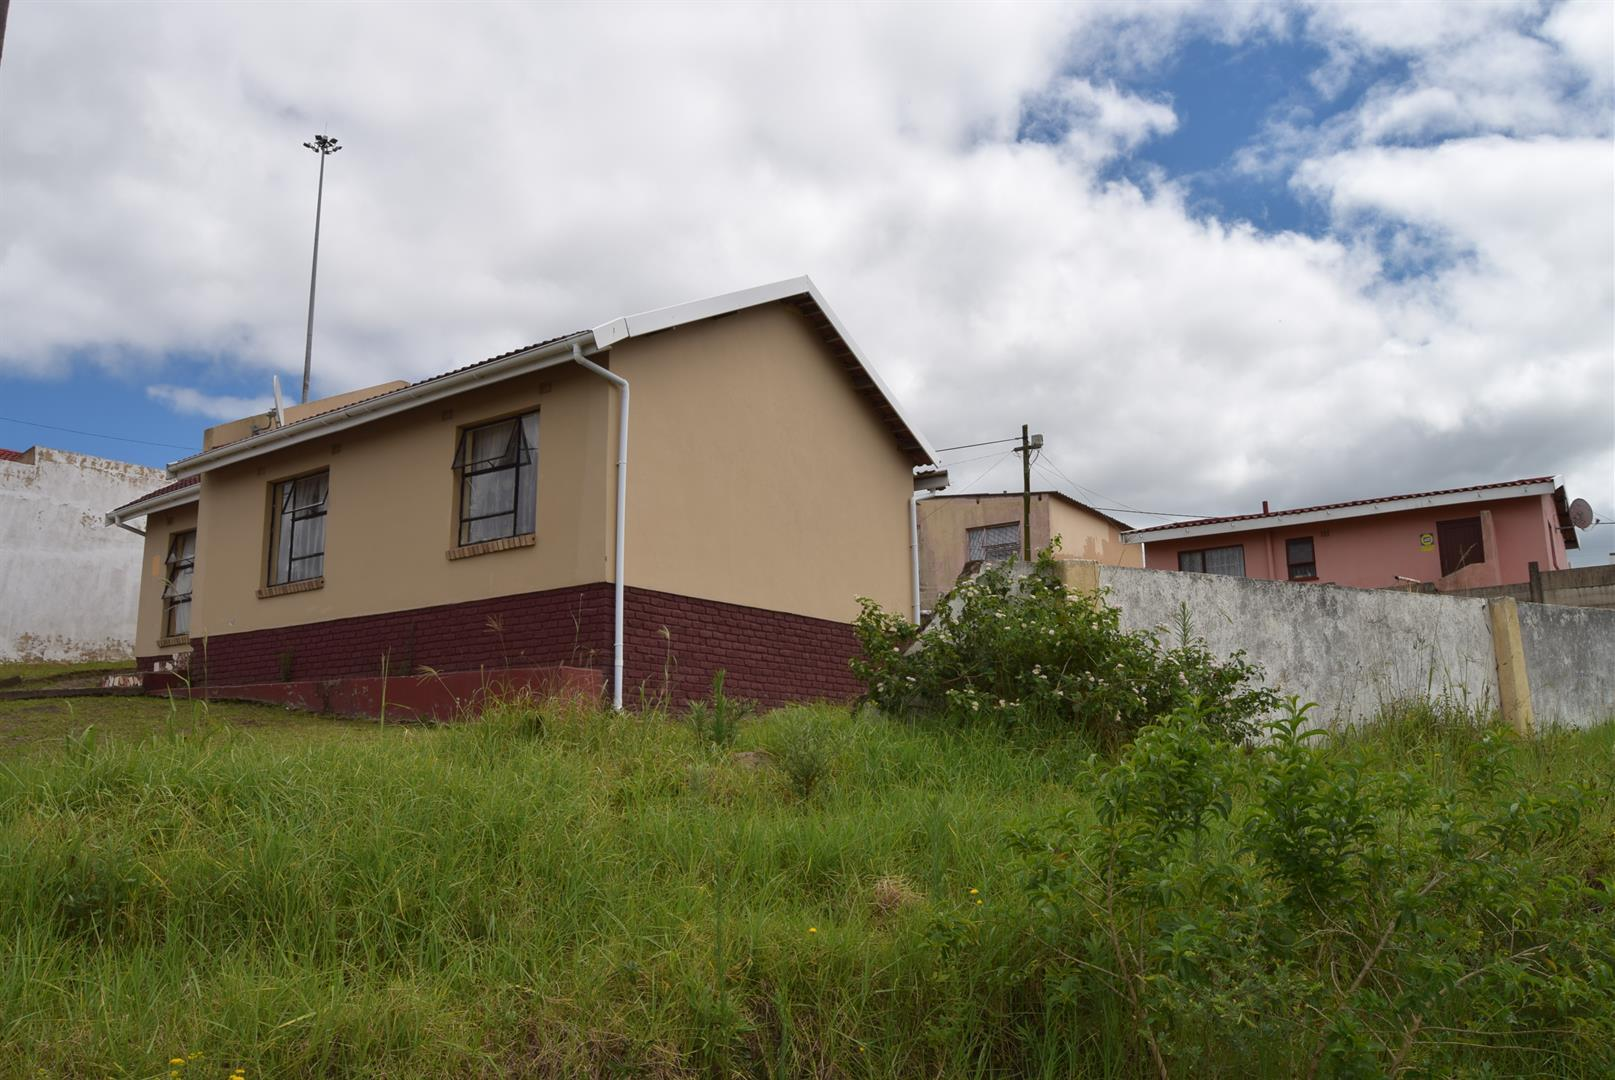 East London, Mdantsane Property  | Houses For Sale Mdantsane, Mdantsane, House 3 bedrooms property for sale Price:499,000